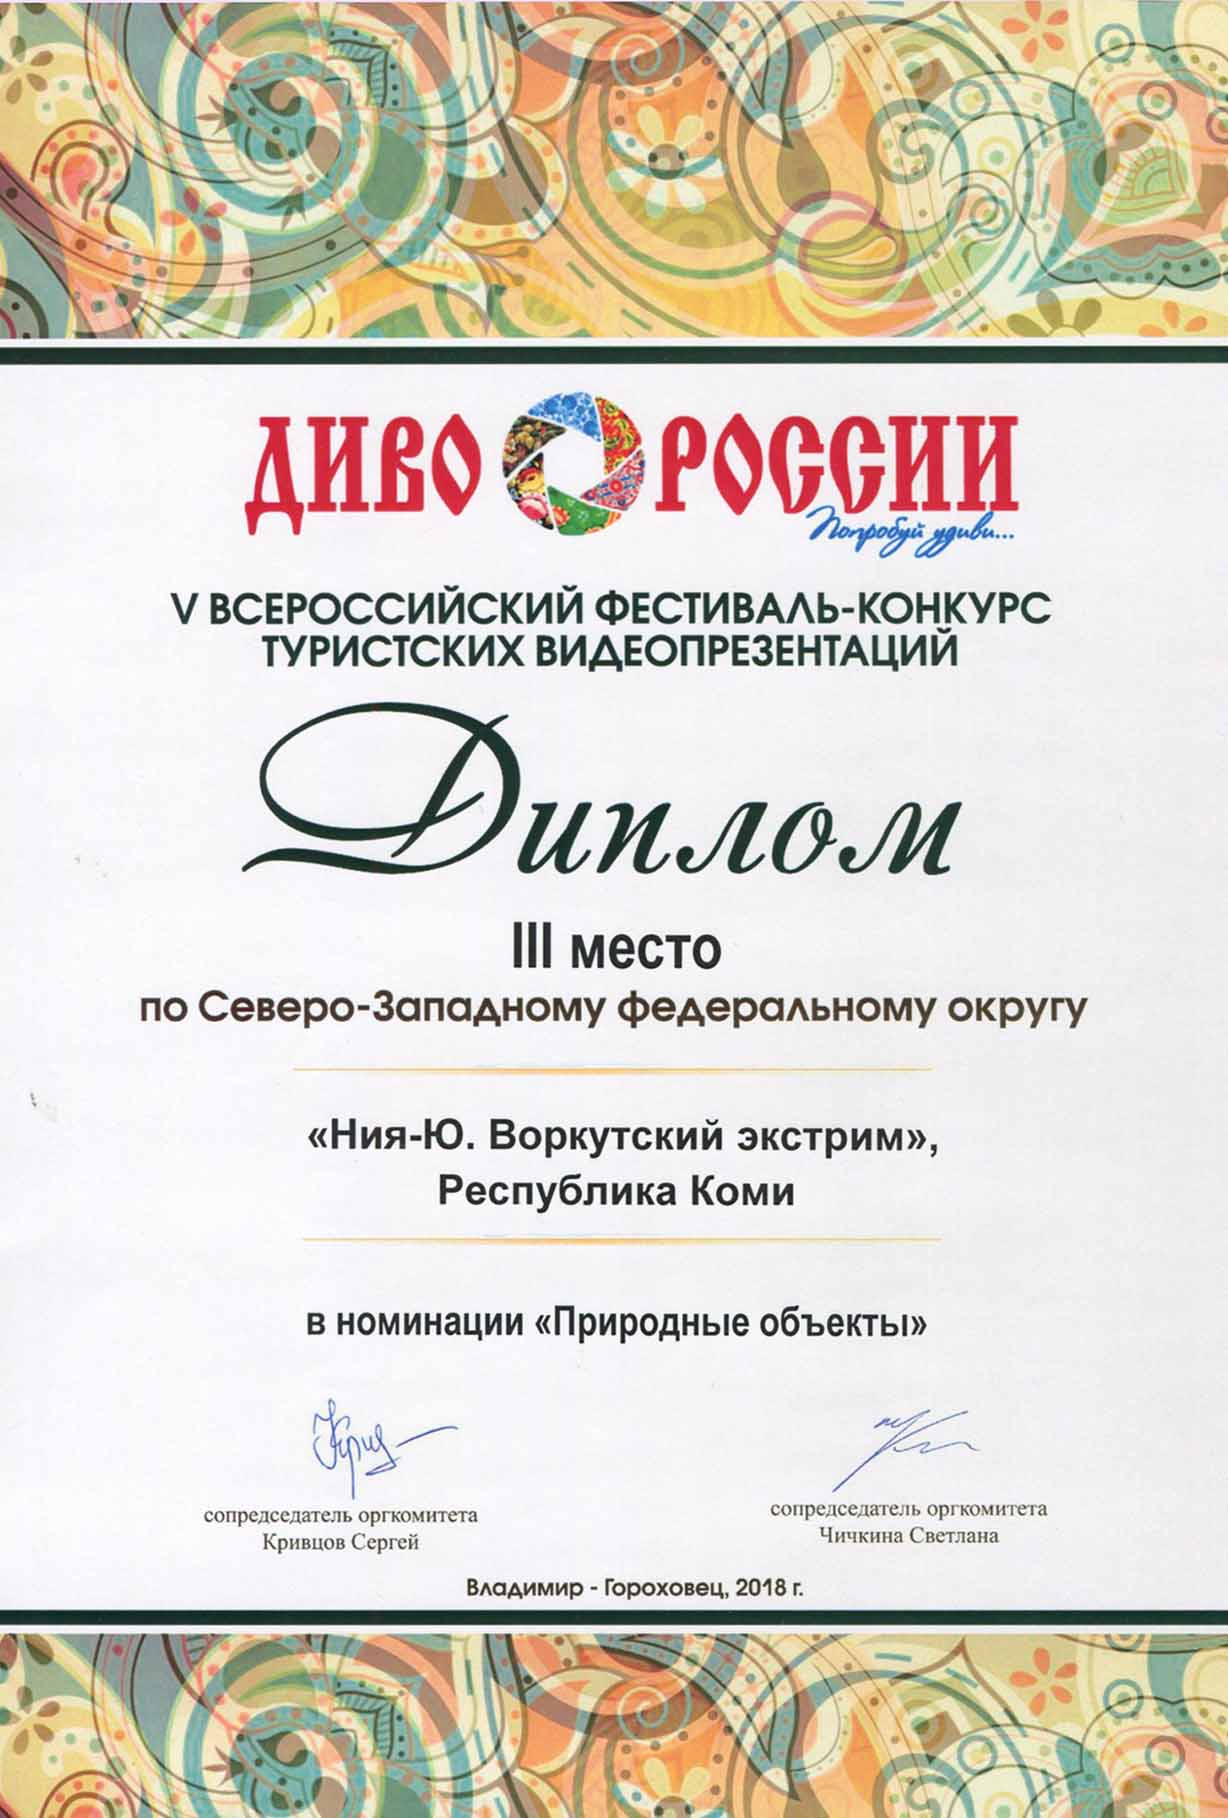 Диво России, Воркутинский Экстрим